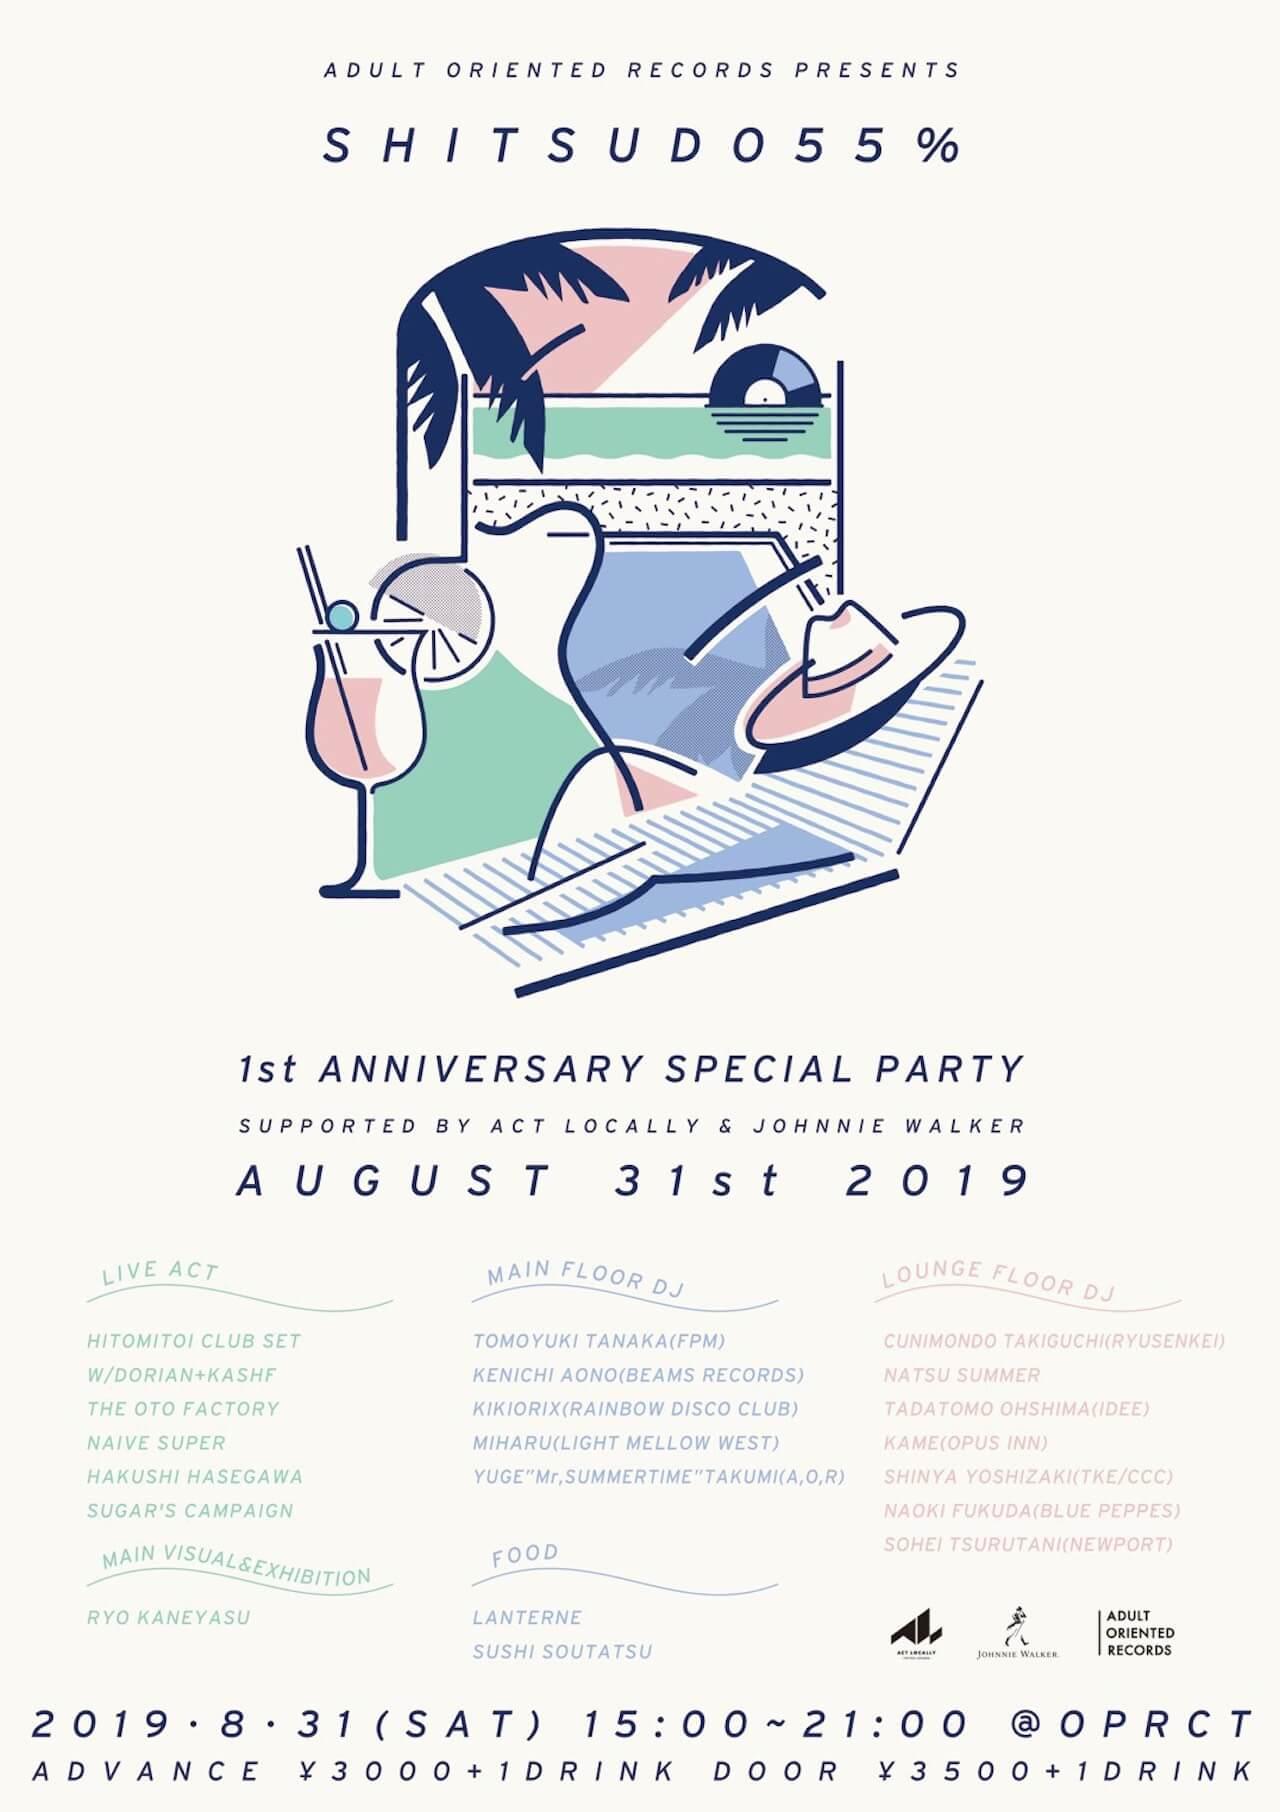 Adult Oriented Records1周年イベントで、ディグが捗るキュートなレコードバッグが発売 長谷川白紙のブートレグプロジェクト7インチの詳細も発表 music190821-adultorientedrecords